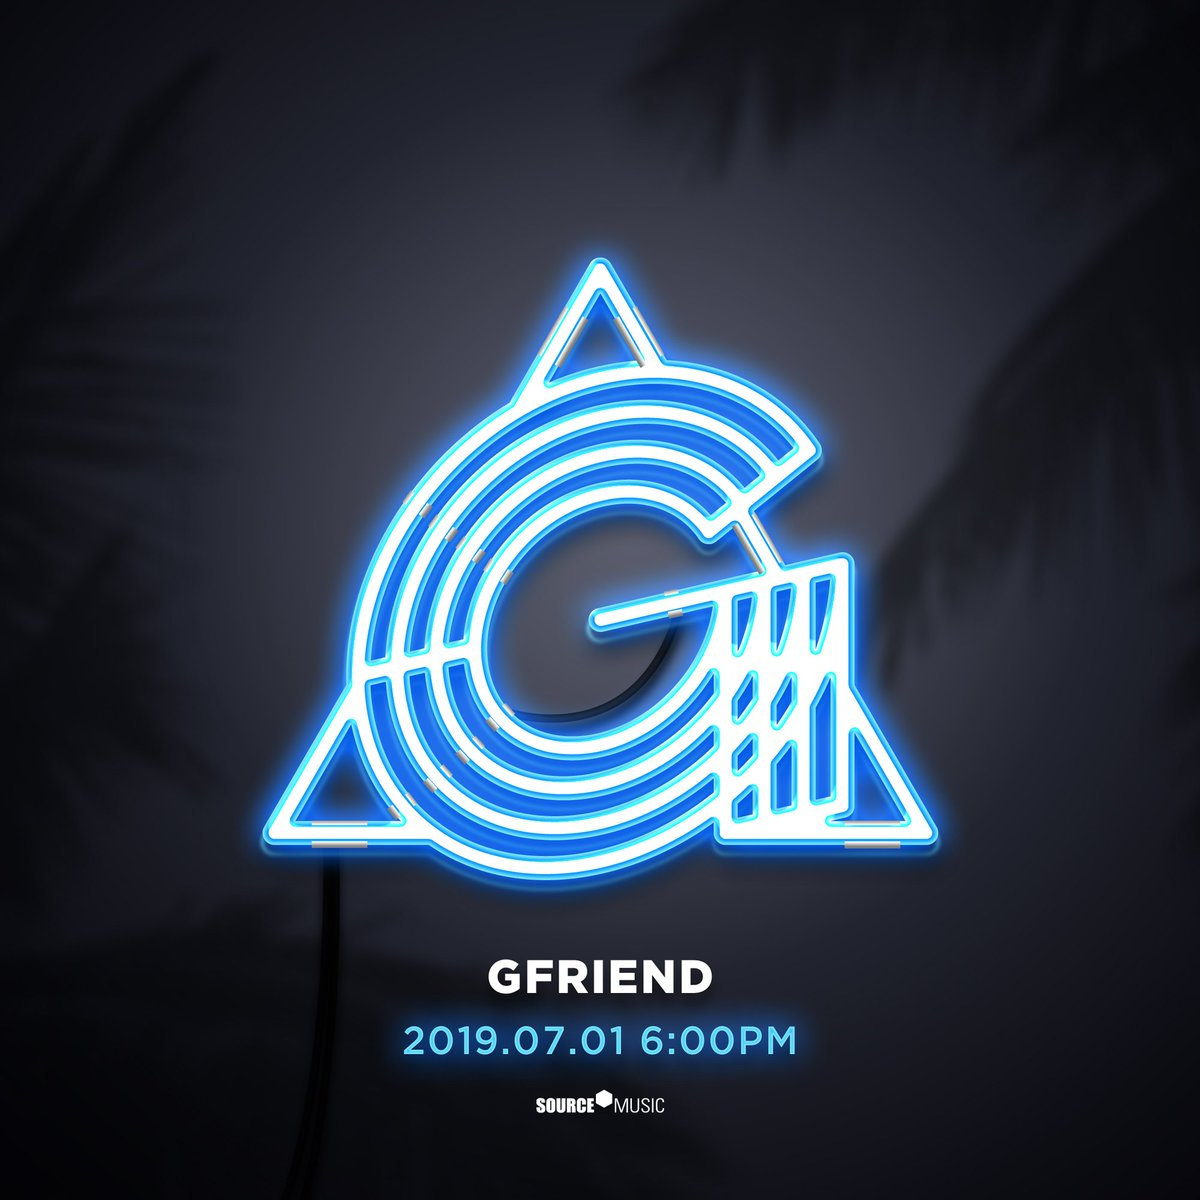 Persaingan musim panas tahun ini bakal ketat banget dengan banyaknya grup keren yang comeback di Juni-Juli. Tak mau ketinggalan adalah @GFRDofficial yang merilis 2 logo teaser untuk album mini ke-7, FEVER SEASON yang rilis 1 Juli nanti. #GFRIEND